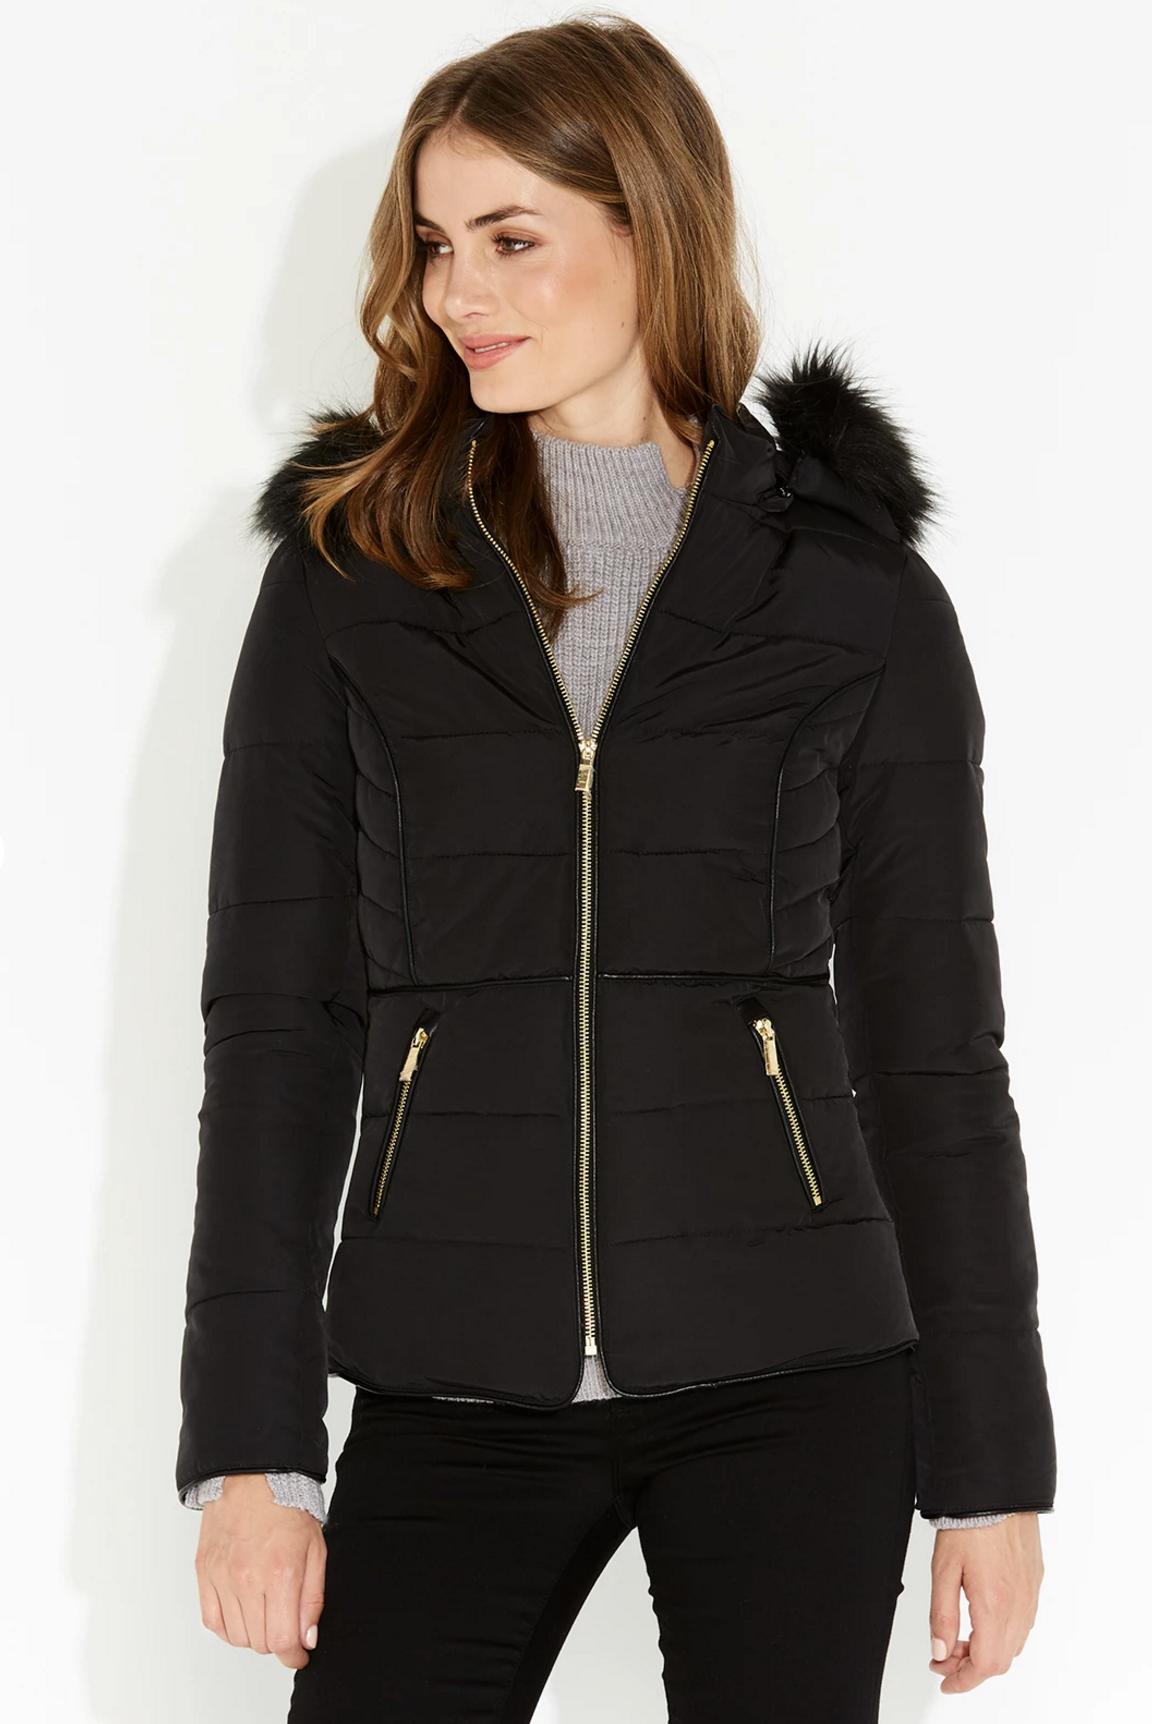 Portmans Suzy short puffer jacket $129.95